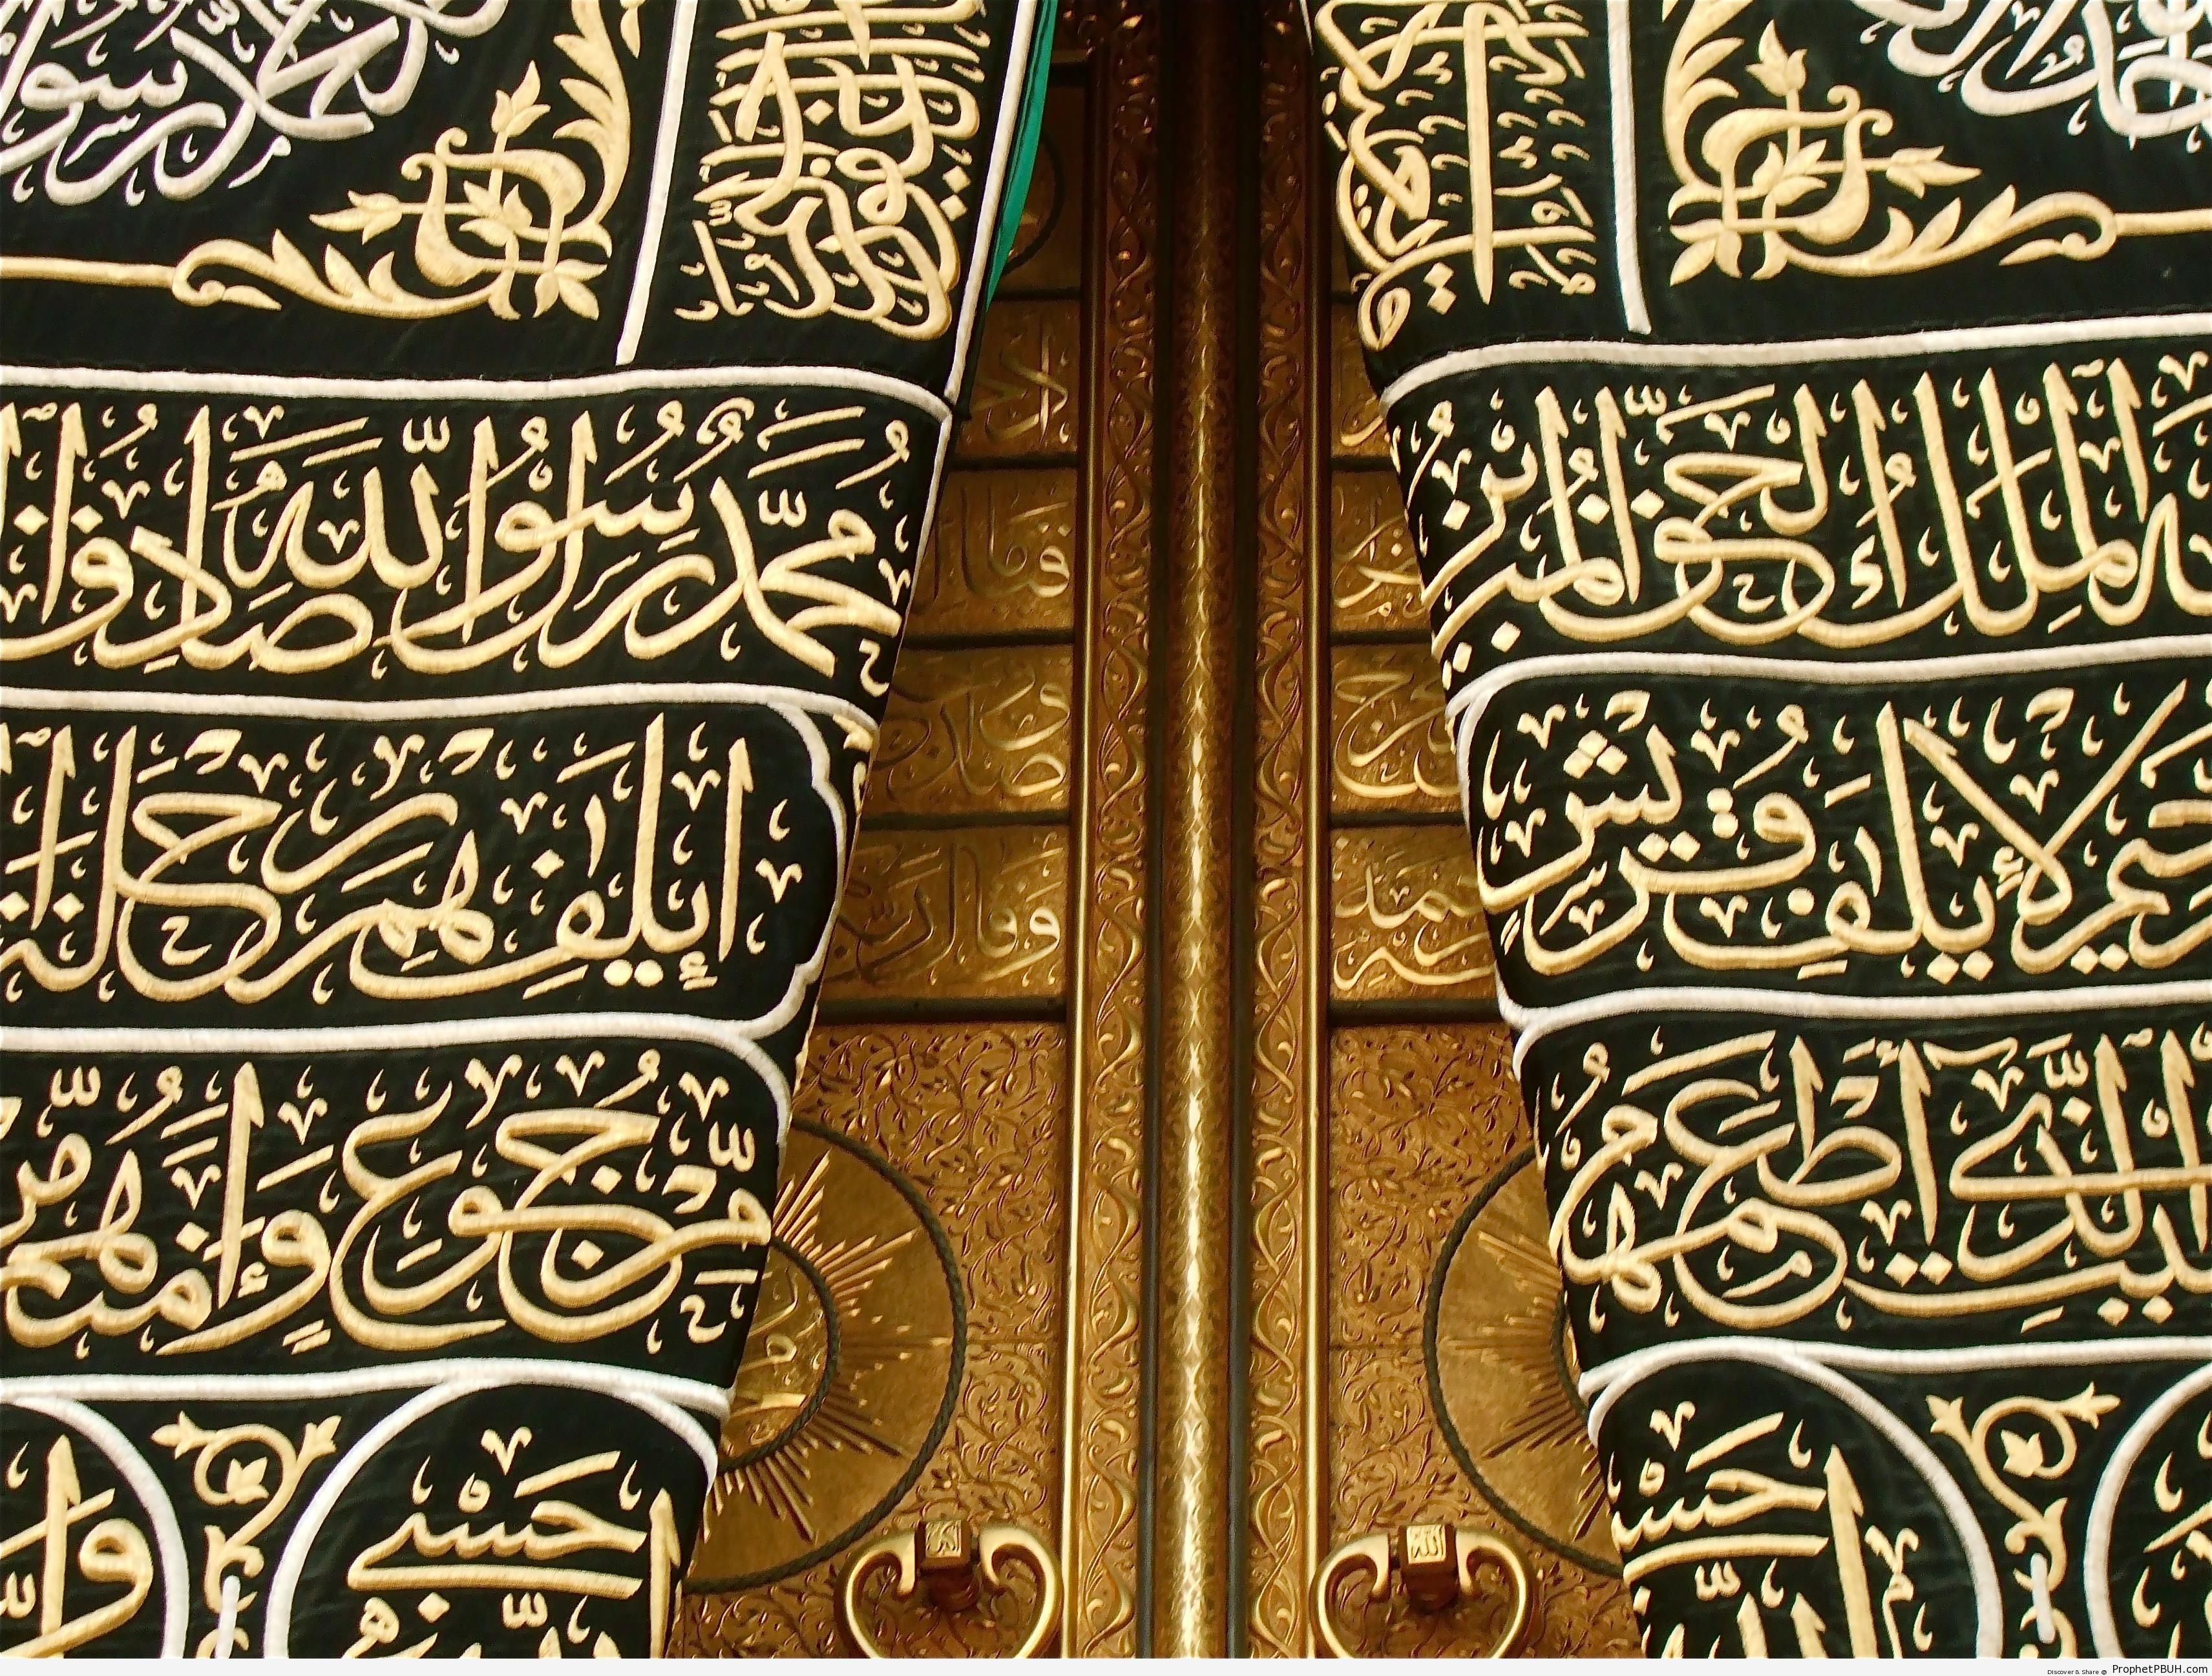 Entrance of al-Kaba (al-Masjid al-Haram, Makkah, Saudi Arabia) - al-Masjid al-Haram in Makkah, Saudi Arabia -Picture